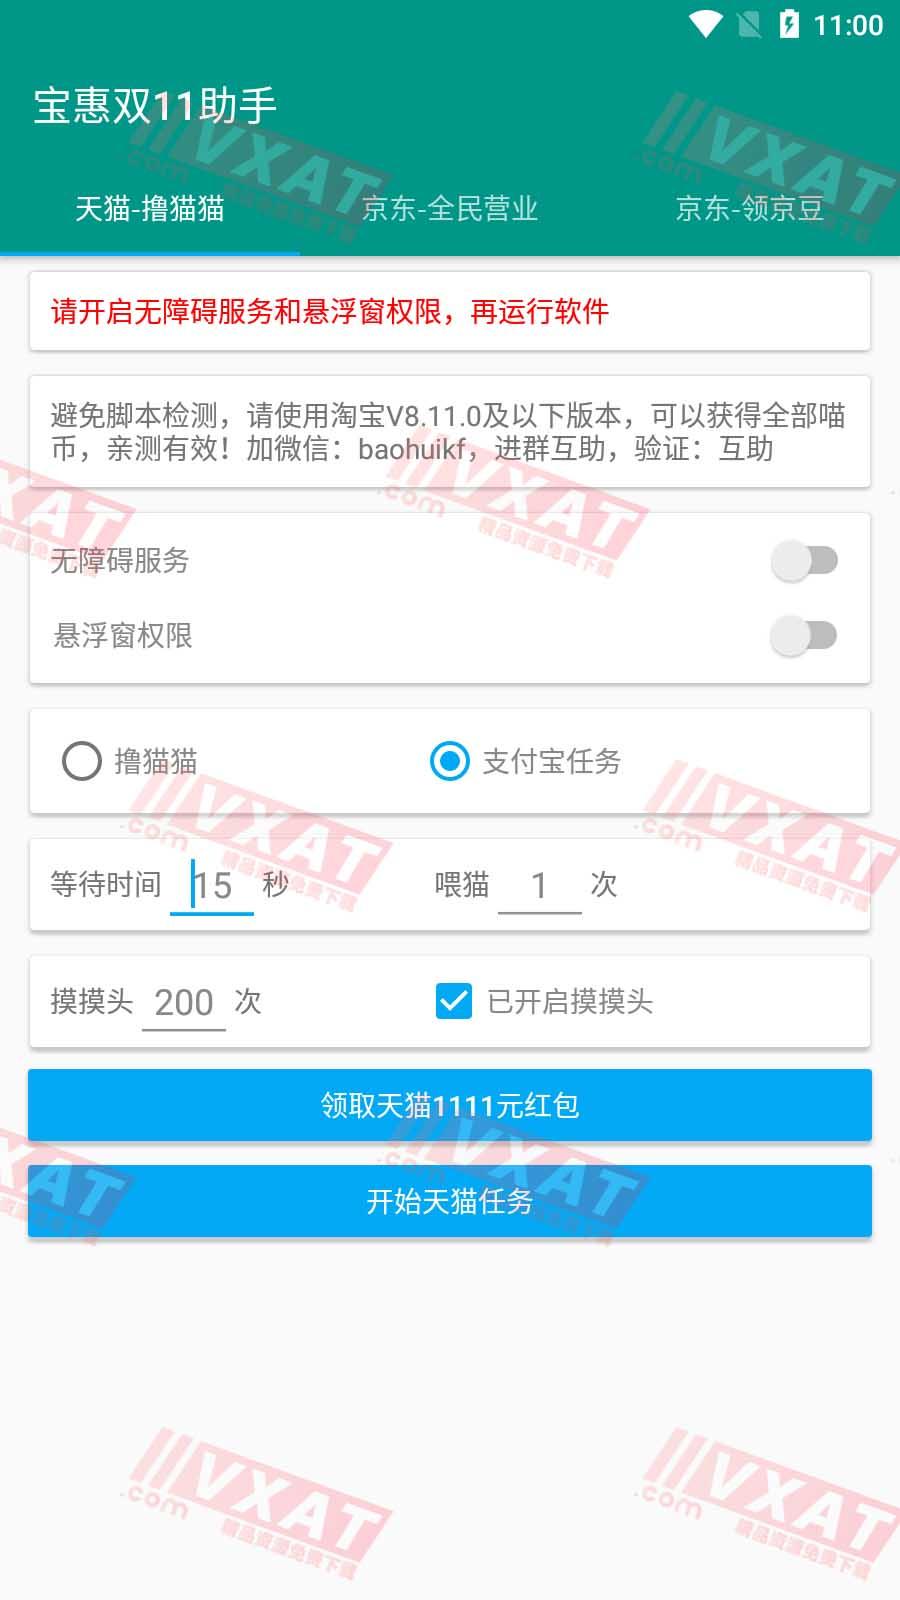 Screenshot_20201029-230030 拷贝.jpg